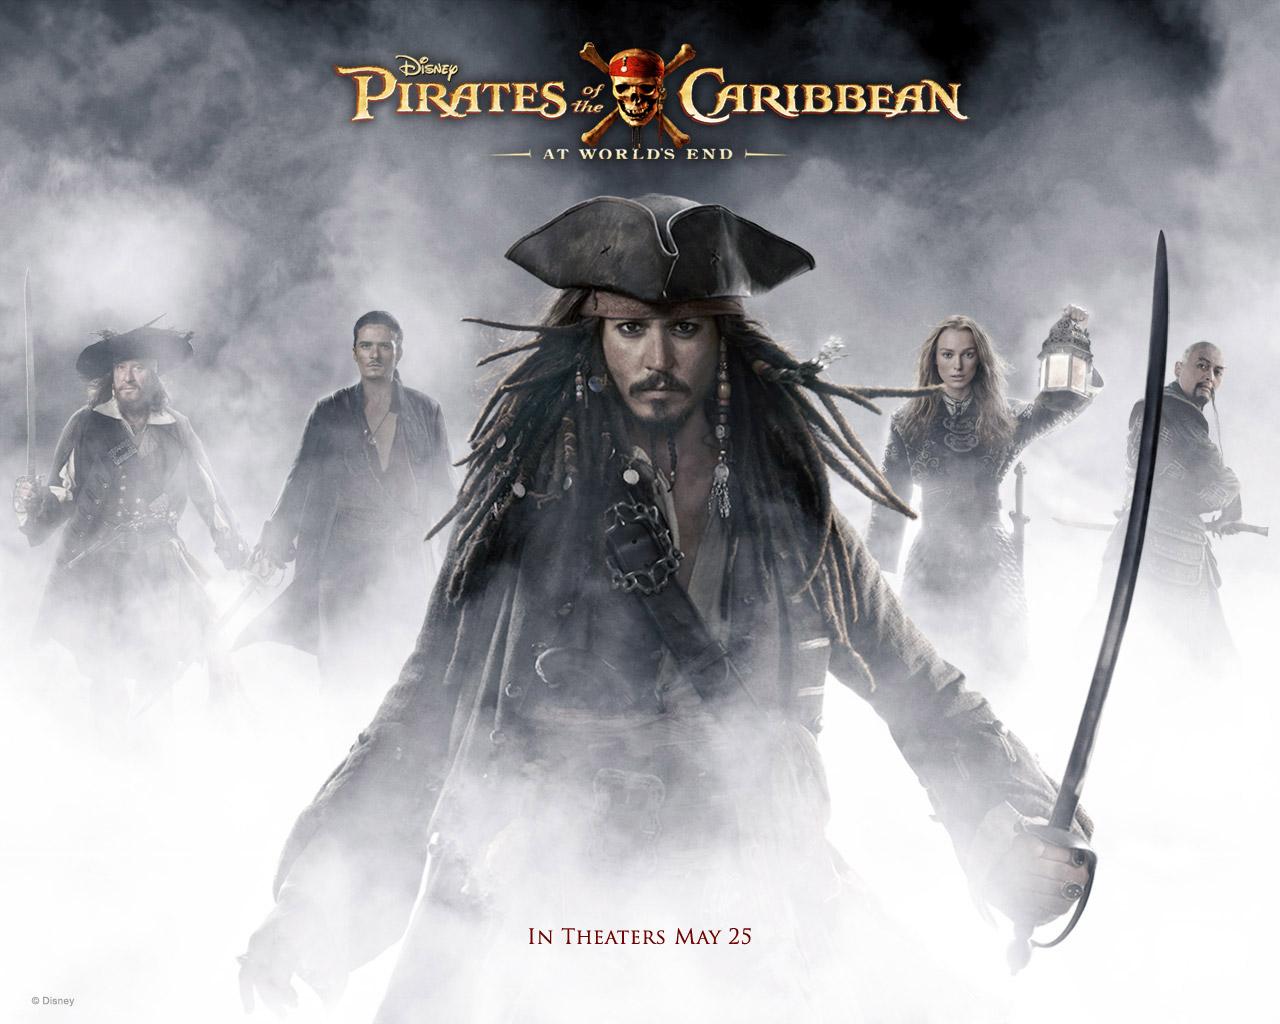 Pirates of the caribbean wallpapers desktop wallpaper 1280x1024